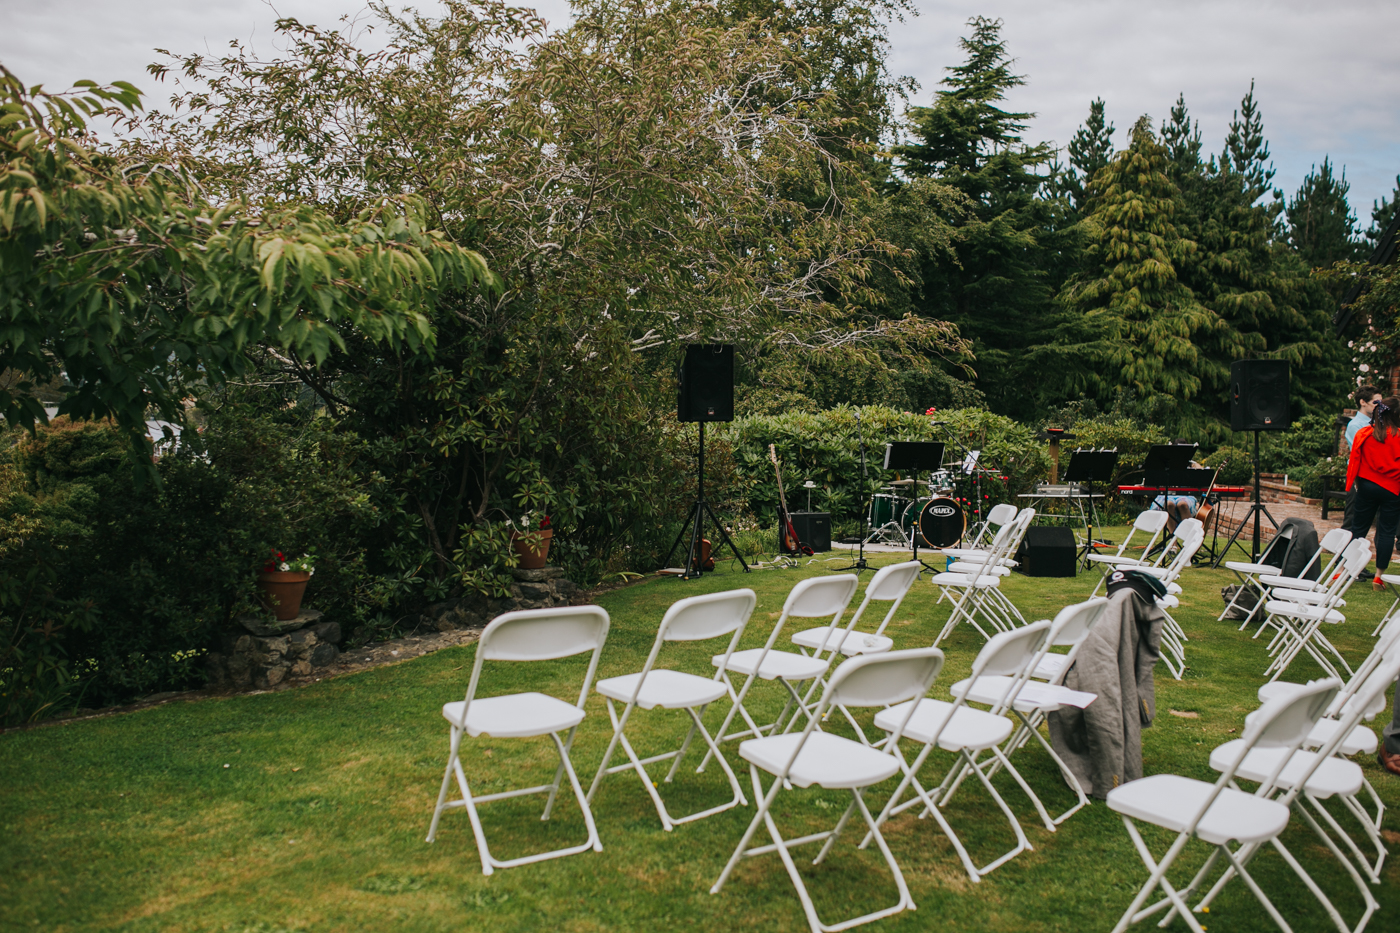 Ariana & Tim - Dunedin, New Zealand Wedding - Destination Wedding - Samantha Heather Photography-70.jpg